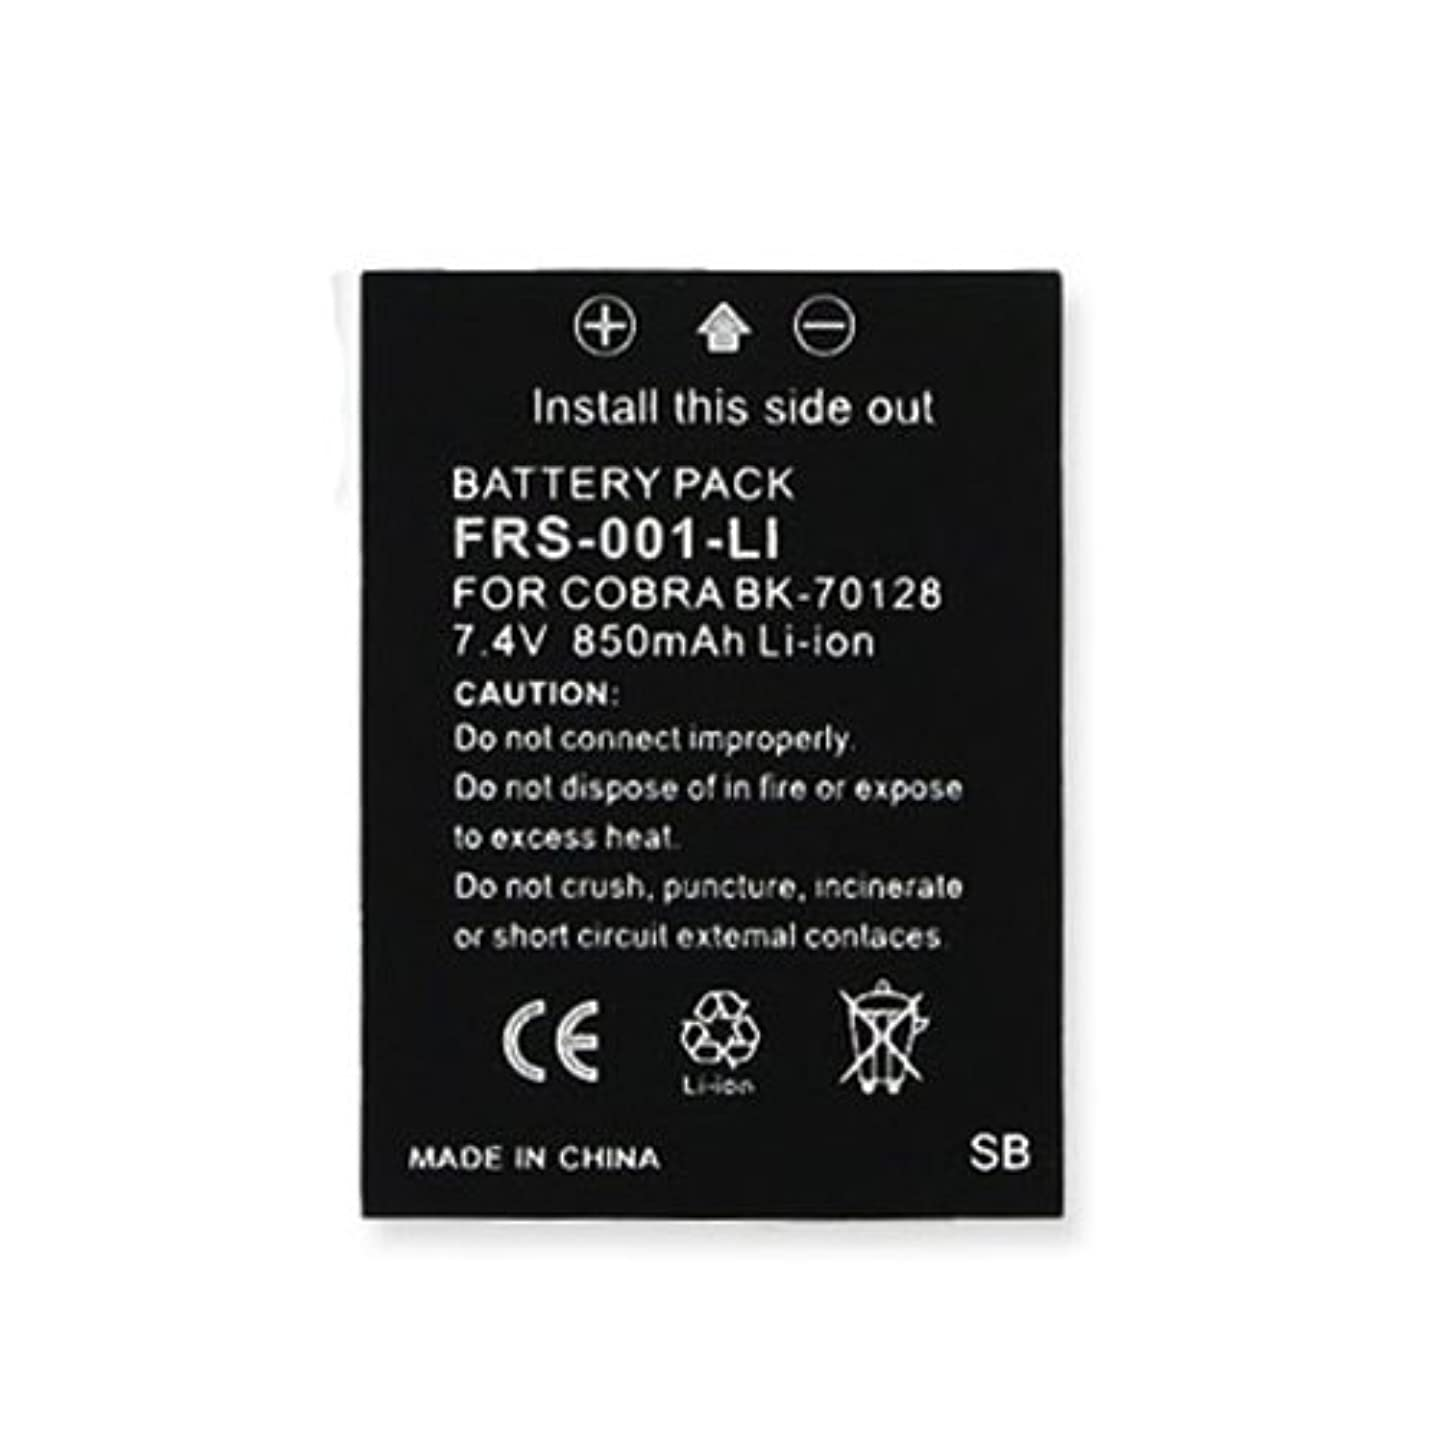 Cobra LI5600-2 DX 2-Way Radio Battery (Li-Ion 7.4V 850mAh) Rechargeable Battery - Replacement for Cobra BK-70128, MN-0160001